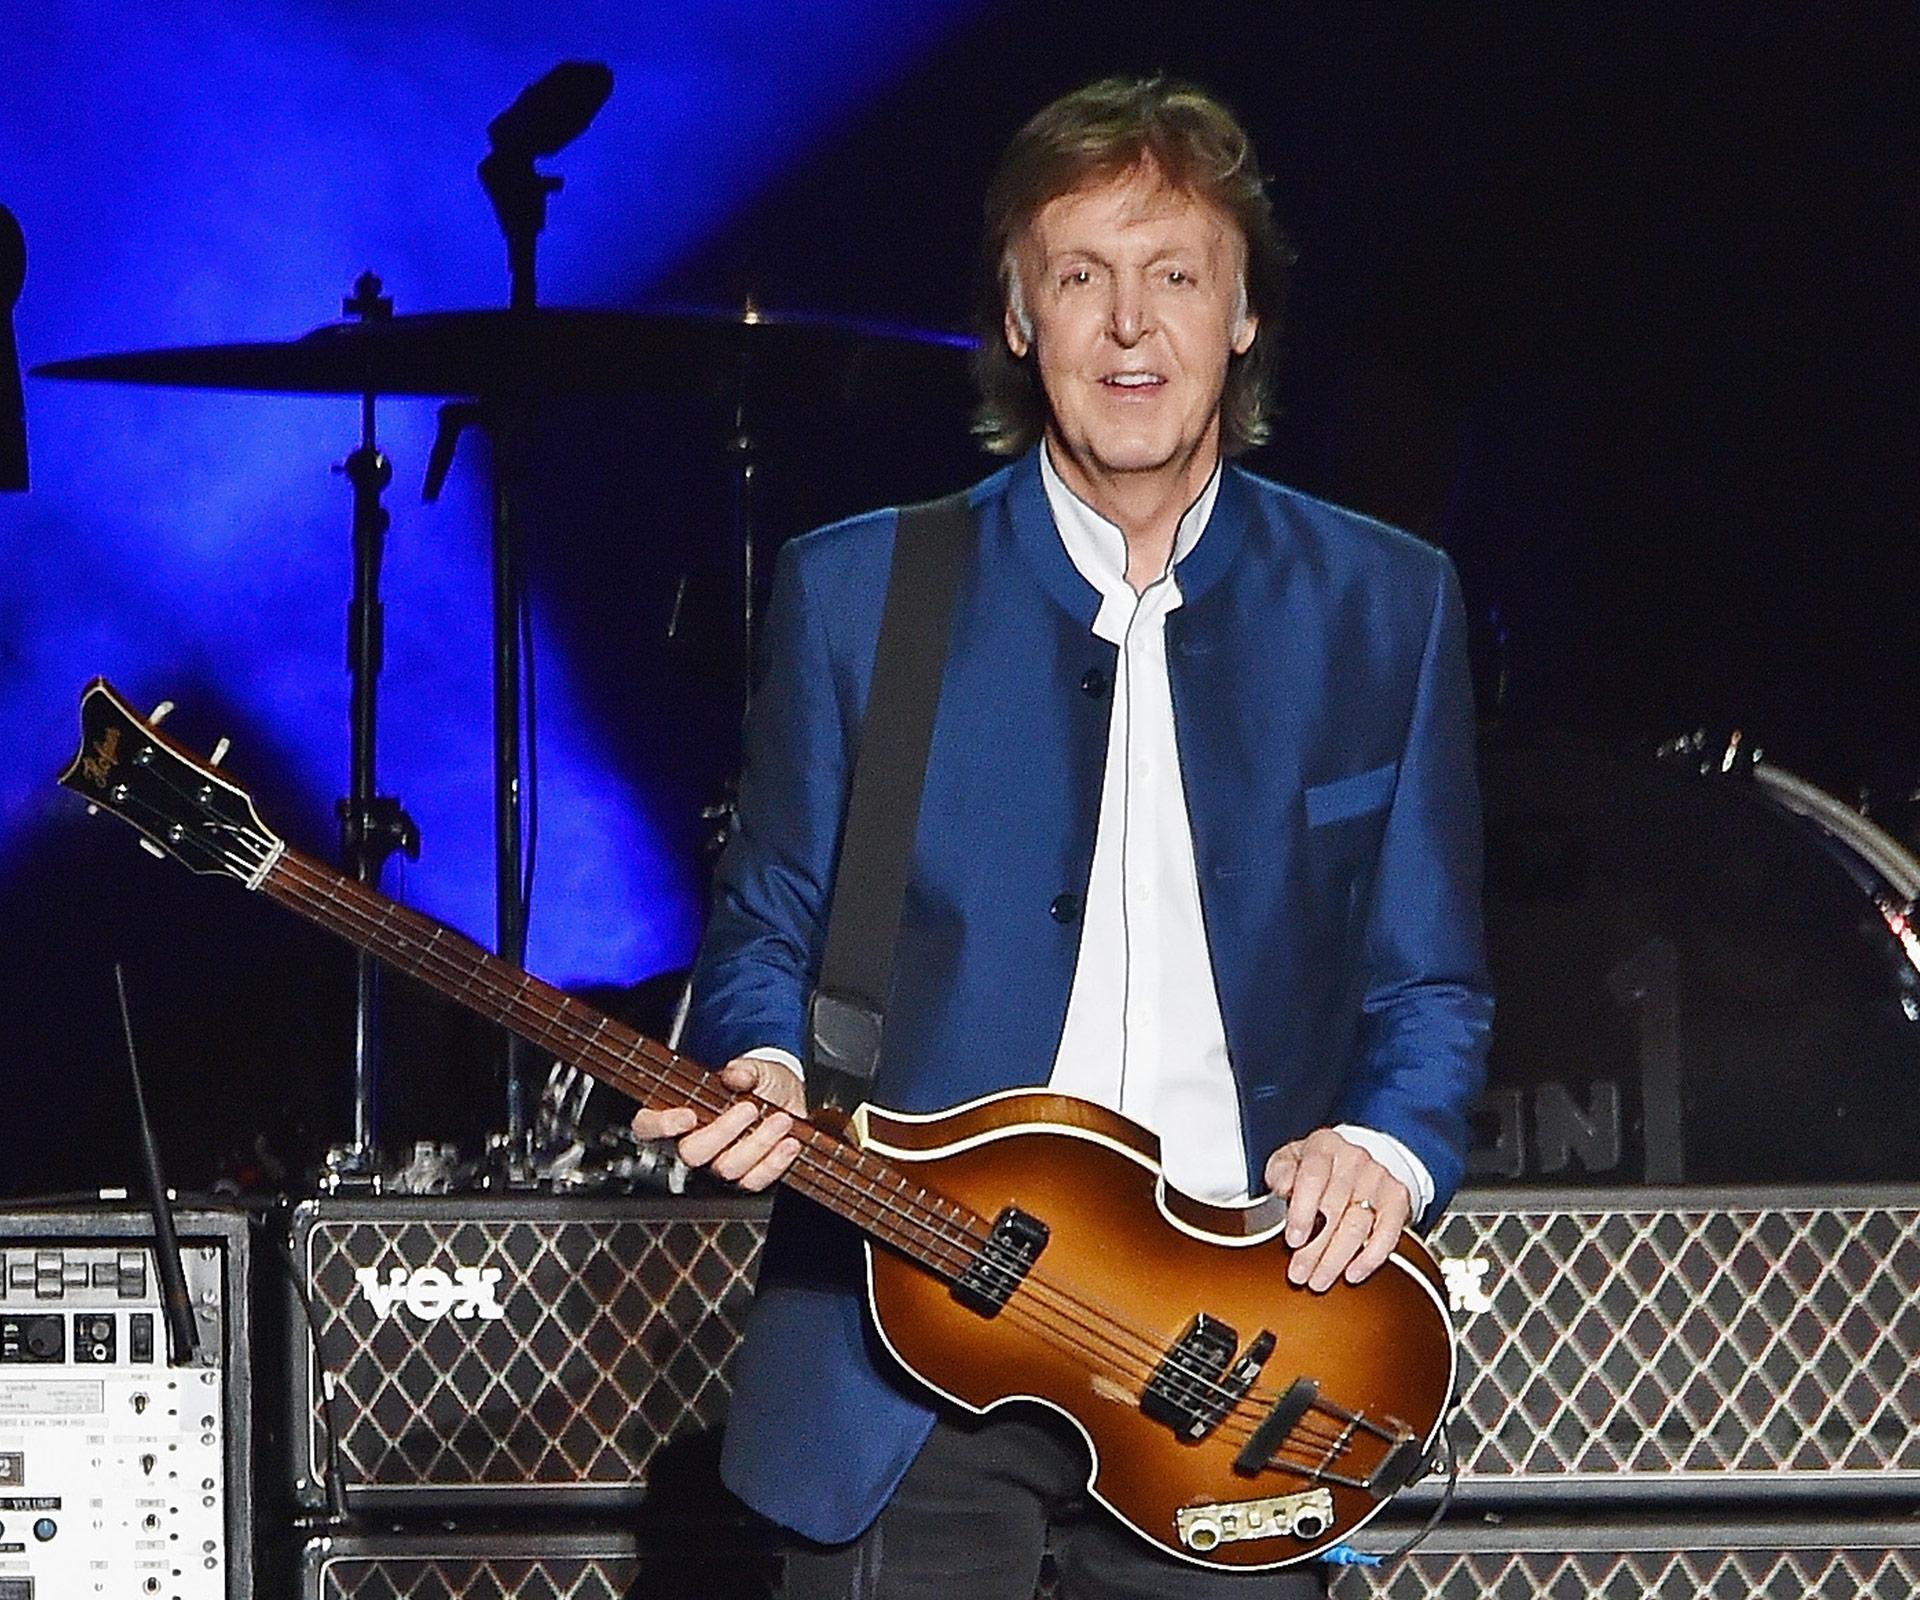 Paul McCartney Confirms 2017 Australian And New Zealand Tour